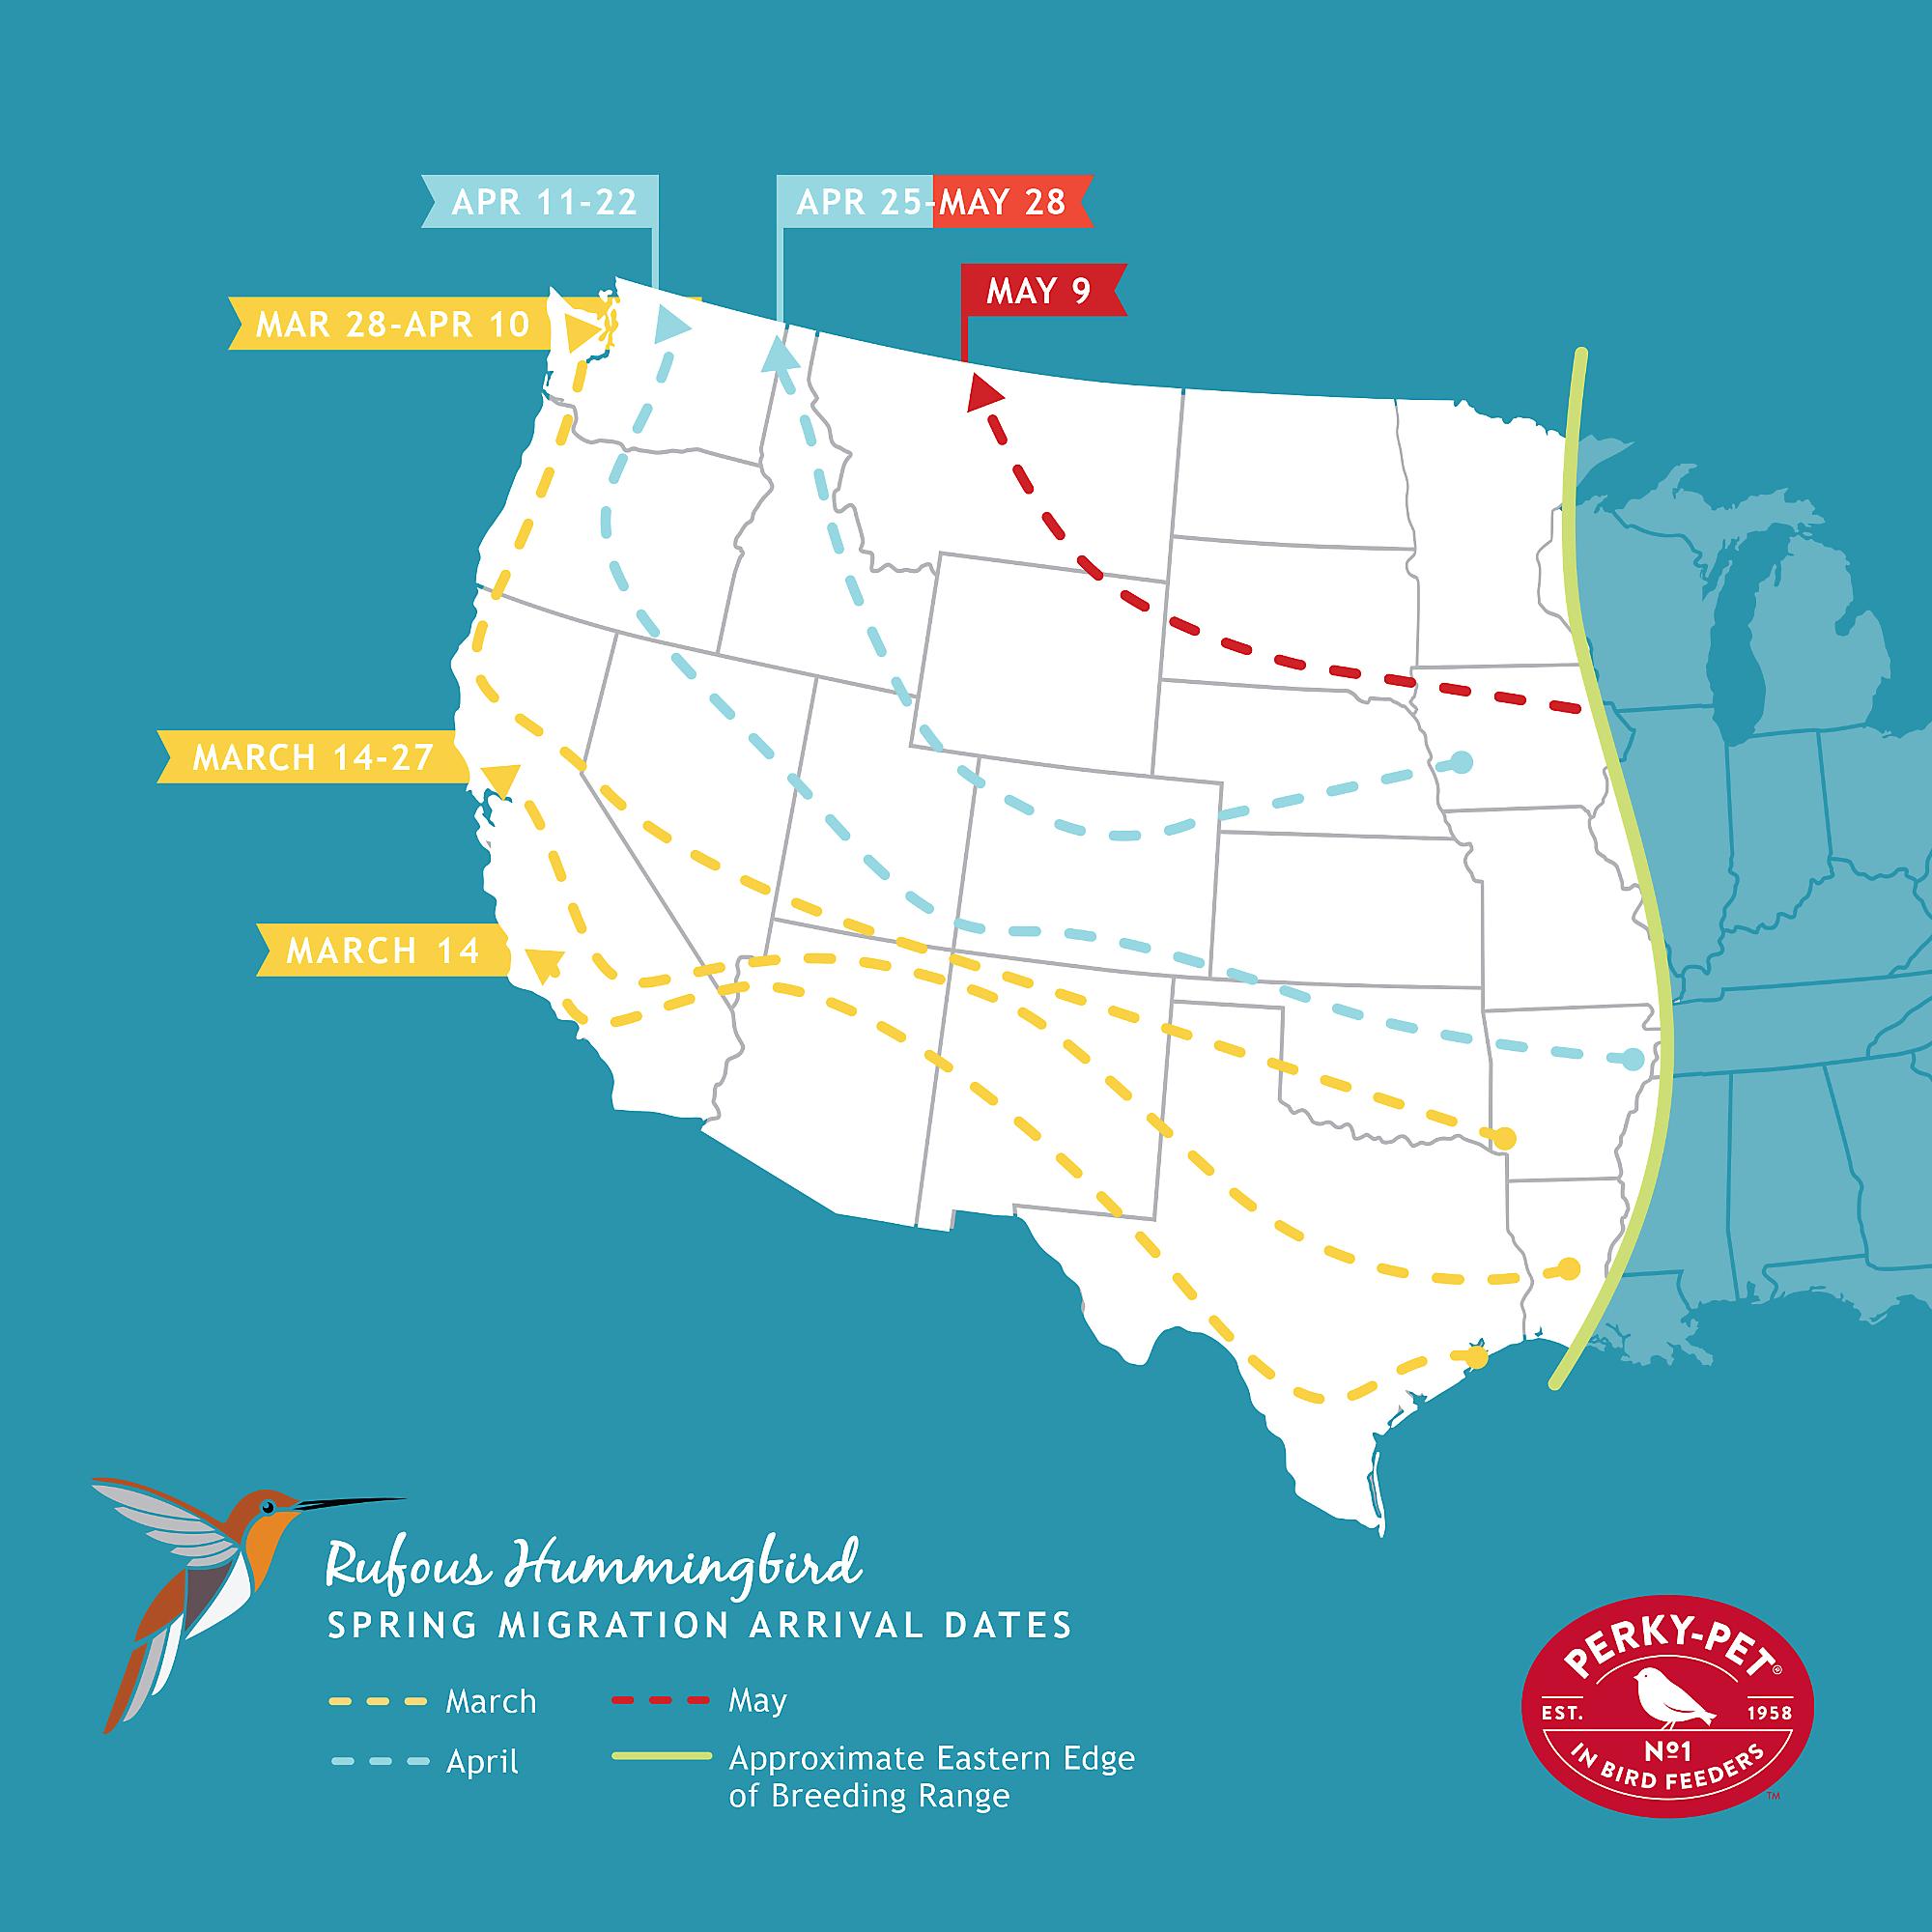 Hummingbird Migration Map rufous hummingbird migration map | Birds and Plants | Hummingbird  Hummingbird Migration Map